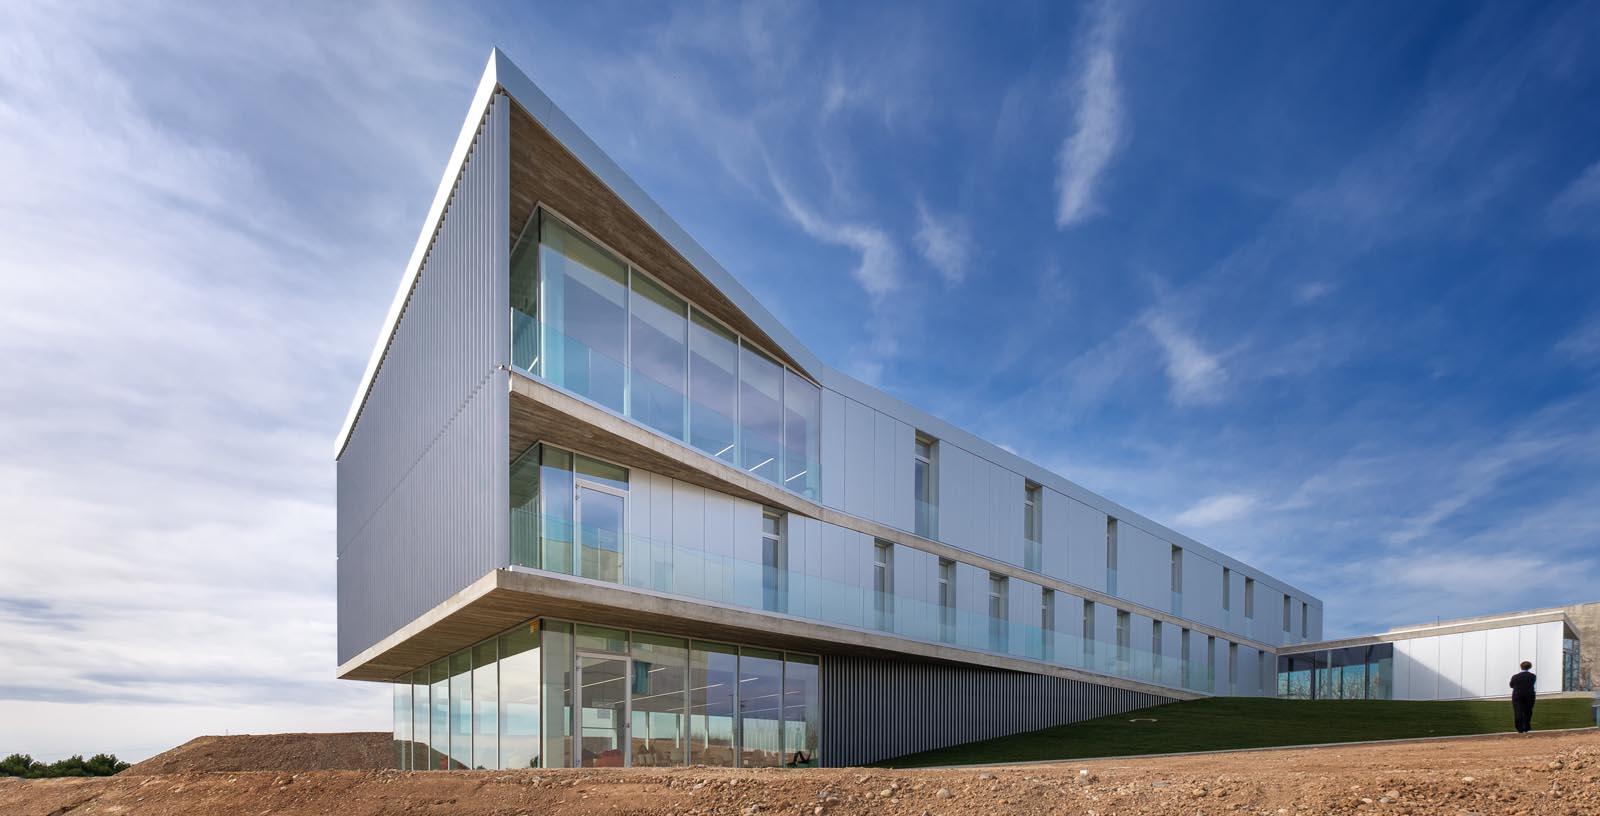 Building-San_Jorge_University_01-Architecture-IDOM-copyright-Inaki_Bergera